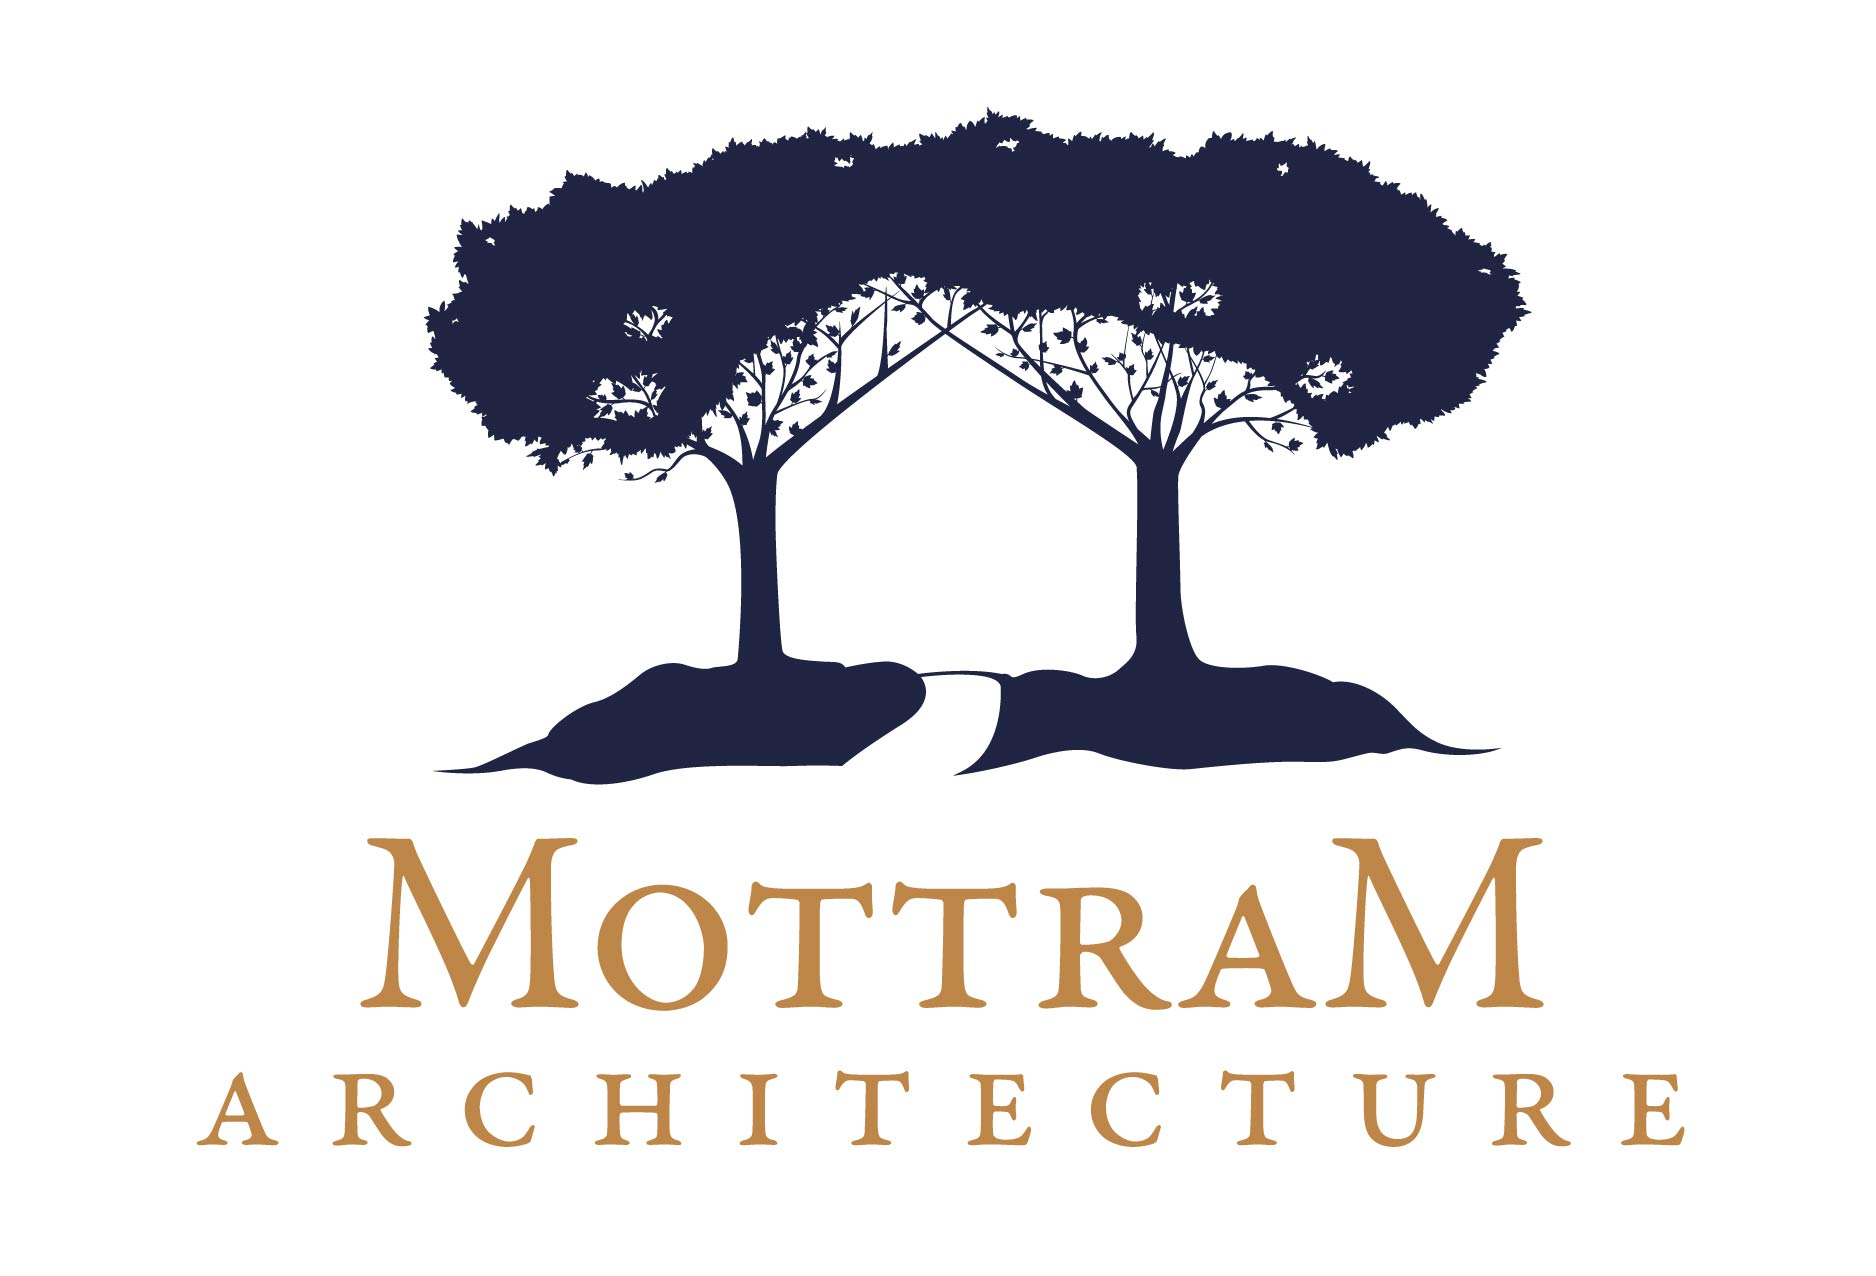 mottram-architecture-logo-final Blue gold-01.jpg